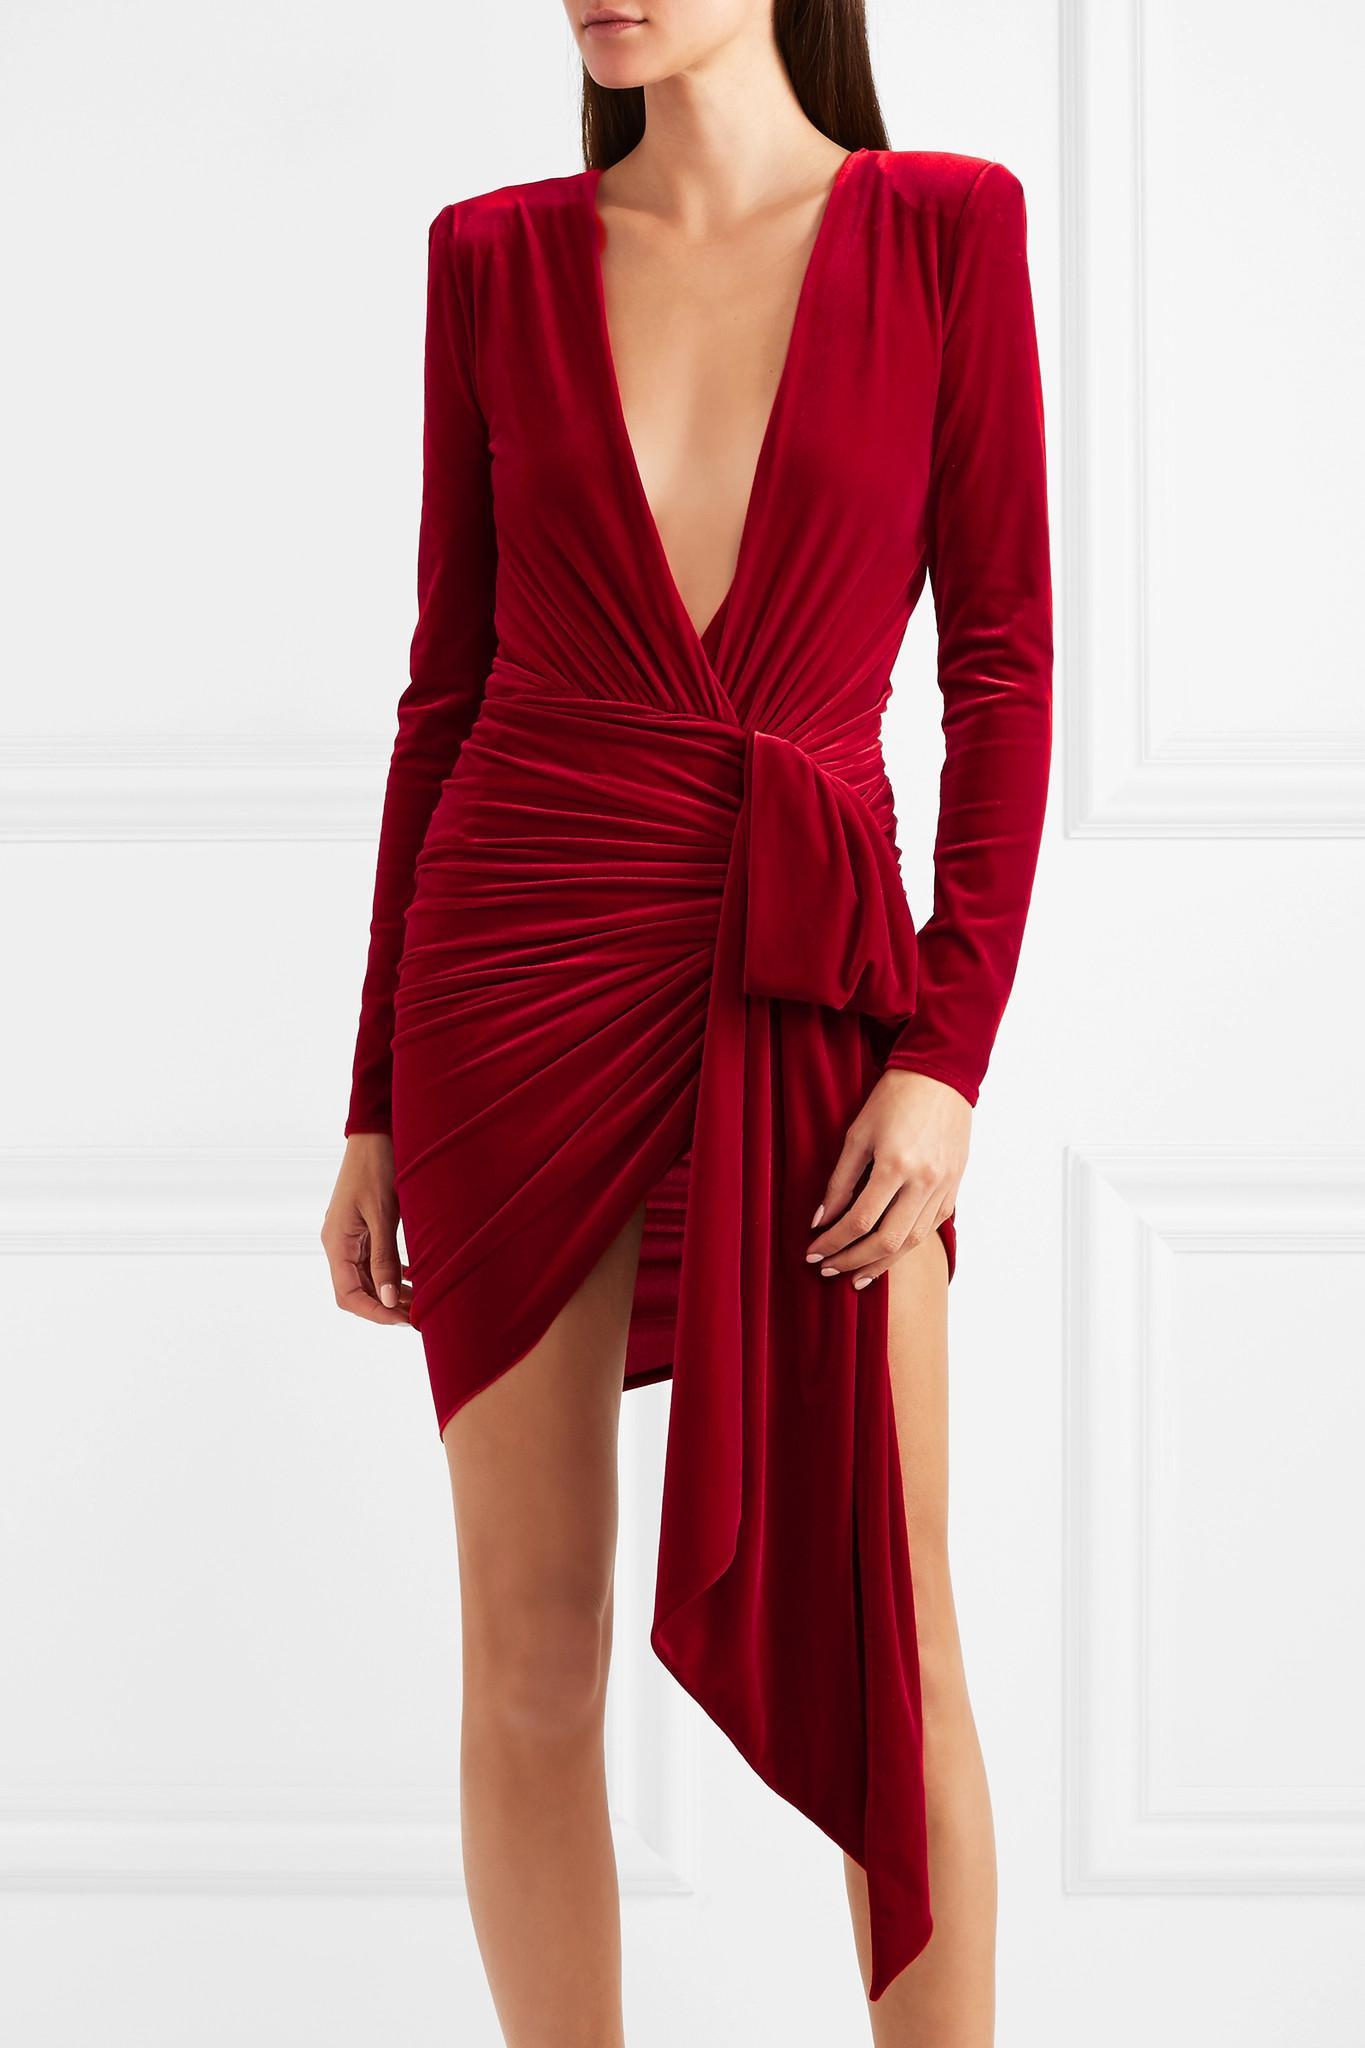 buy good reputable site outlet online Draped Stretch-velvet Mini Dress